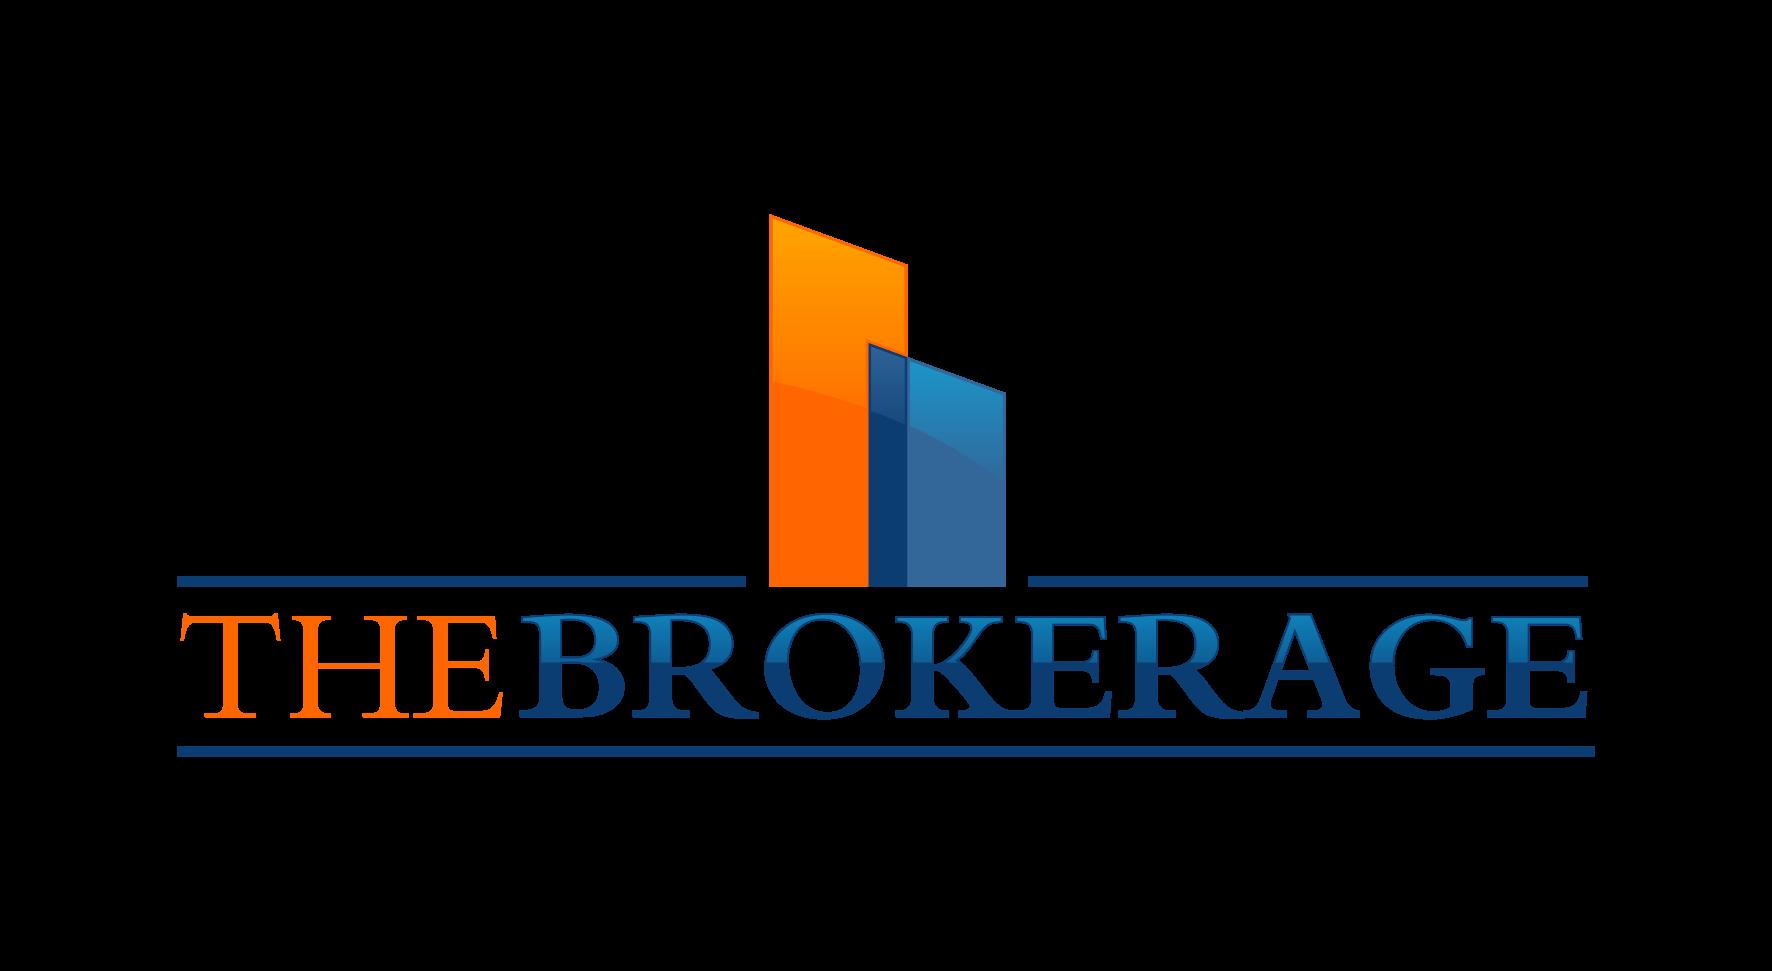 The Brokerage - Logo